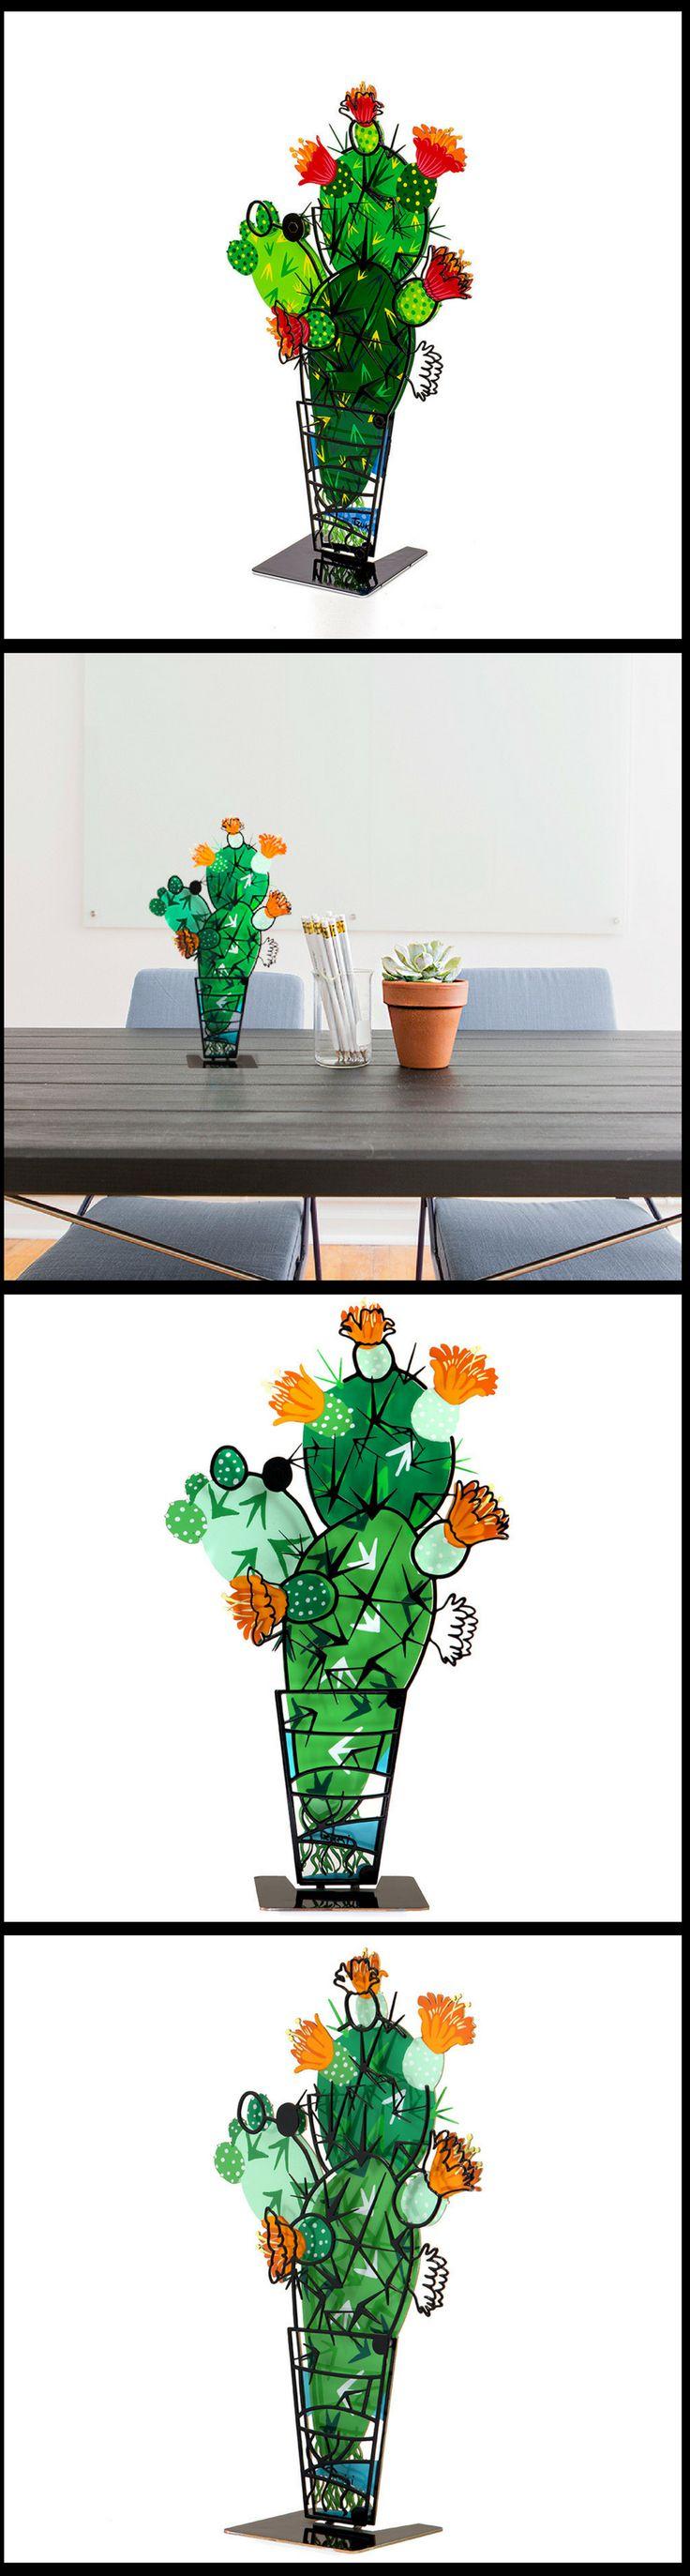 Metal Cactus 3D Sculpture - Home & Office Decor by Tzuki Art!